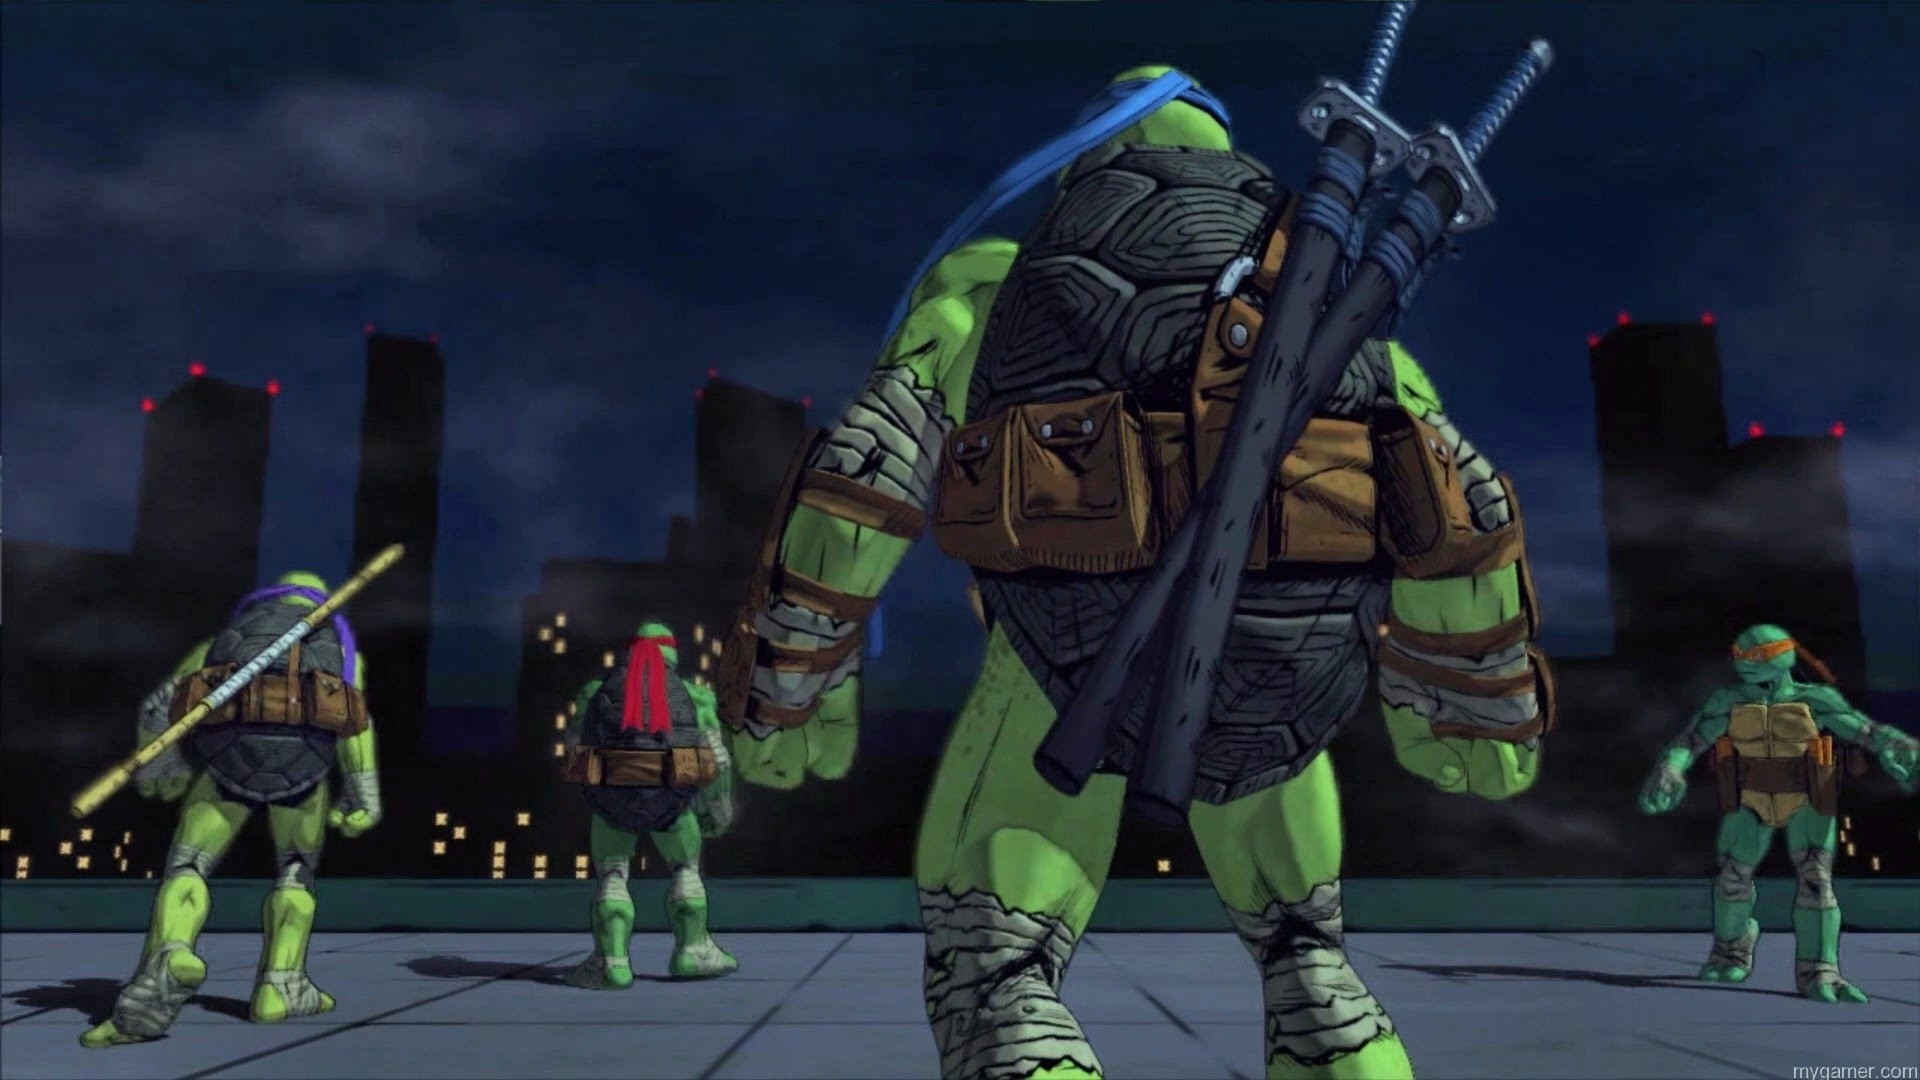 TMNT Mutans in Man backs TMNT: Mutants In Manhattan Xbox One Review TMNT: Mutants In Manhattan (Xbox One) Review With Live Stream TMNT Mutans in Man backs